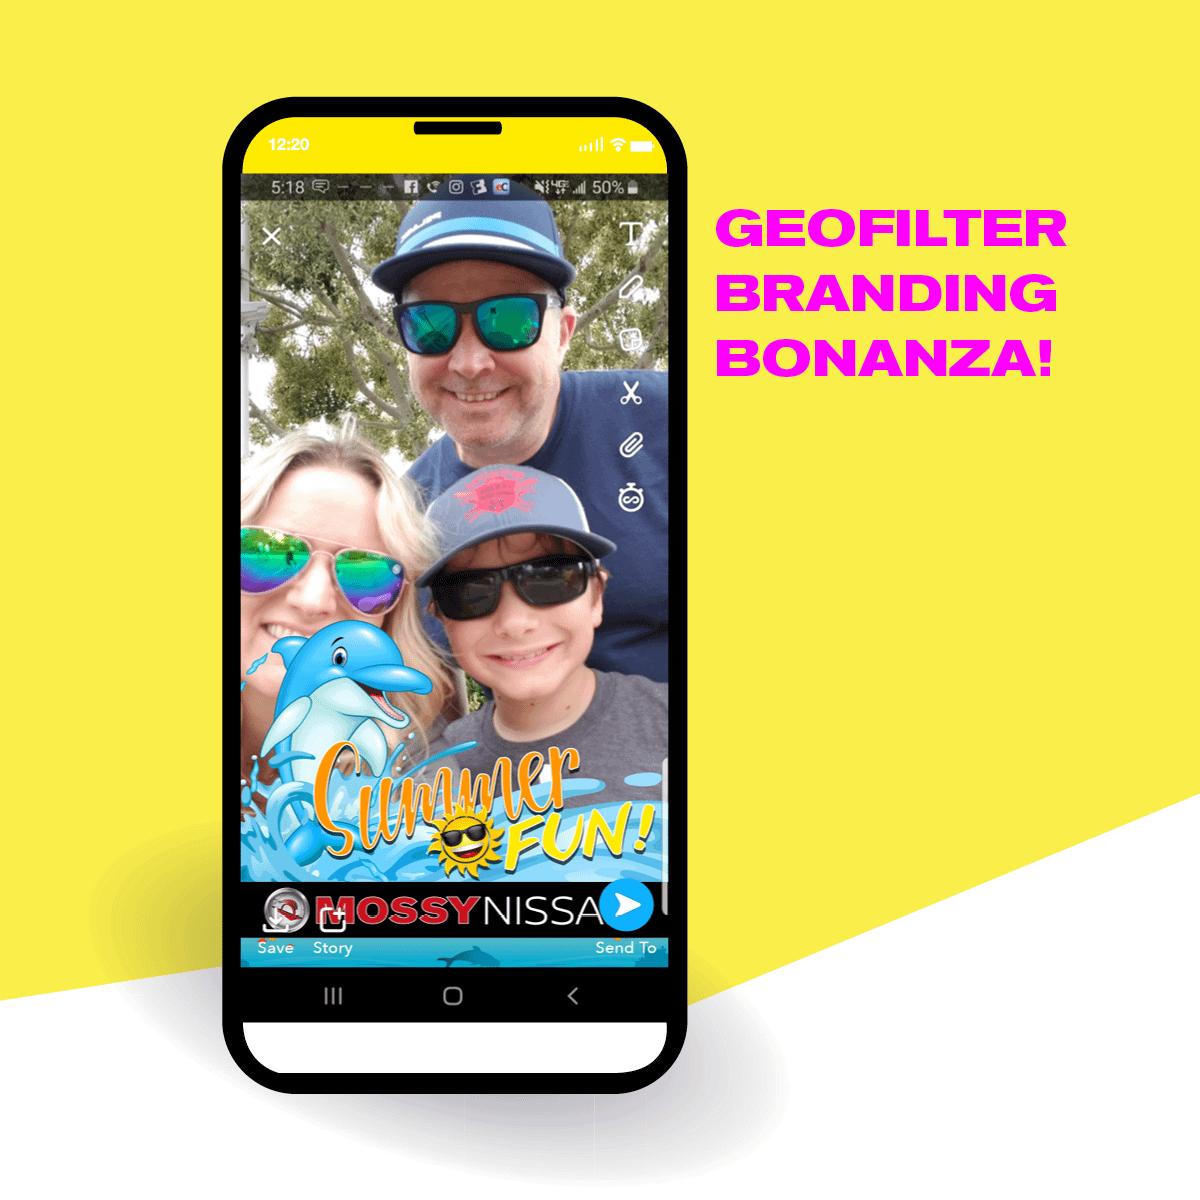 GEOFILTER BRANDING BONANZA